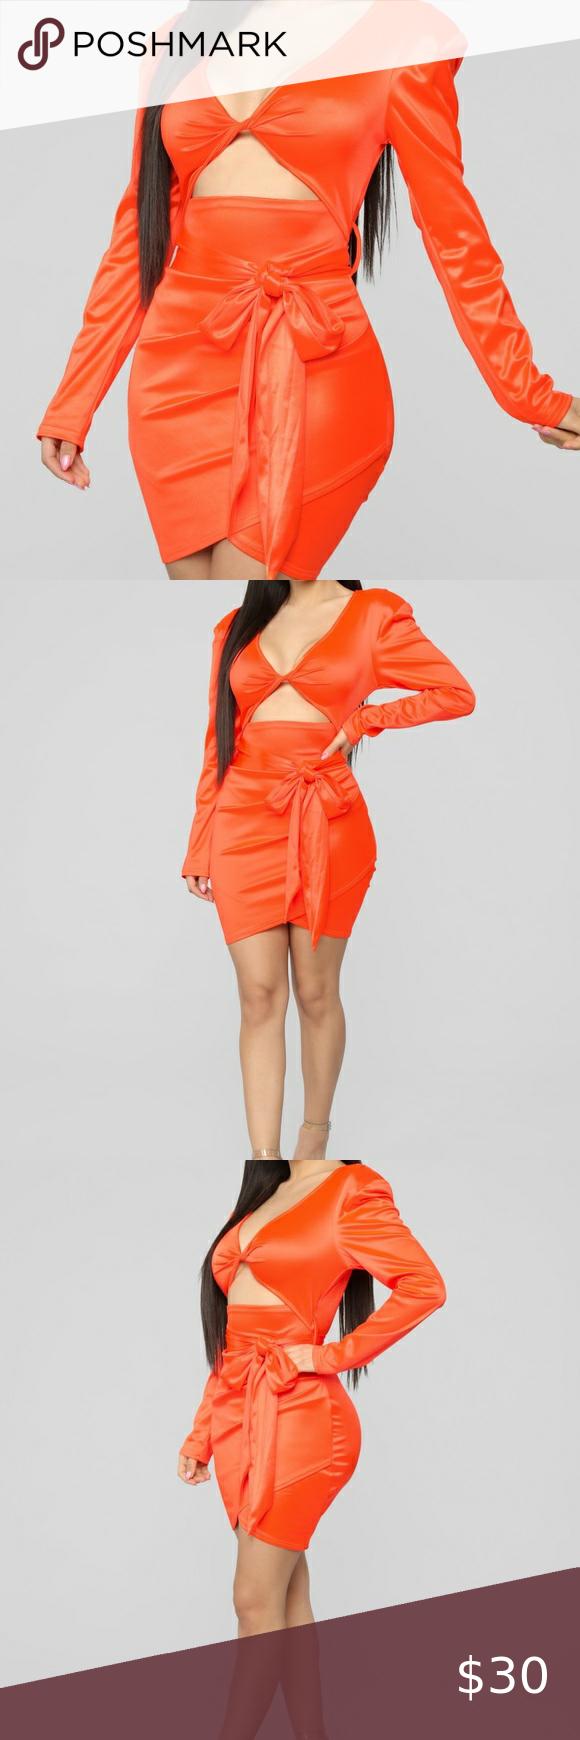 Twenty Fun Satin Dress Satin Dresses Fashion Nova Dress Clothes Design [ 1740 x 580 Pixel ]